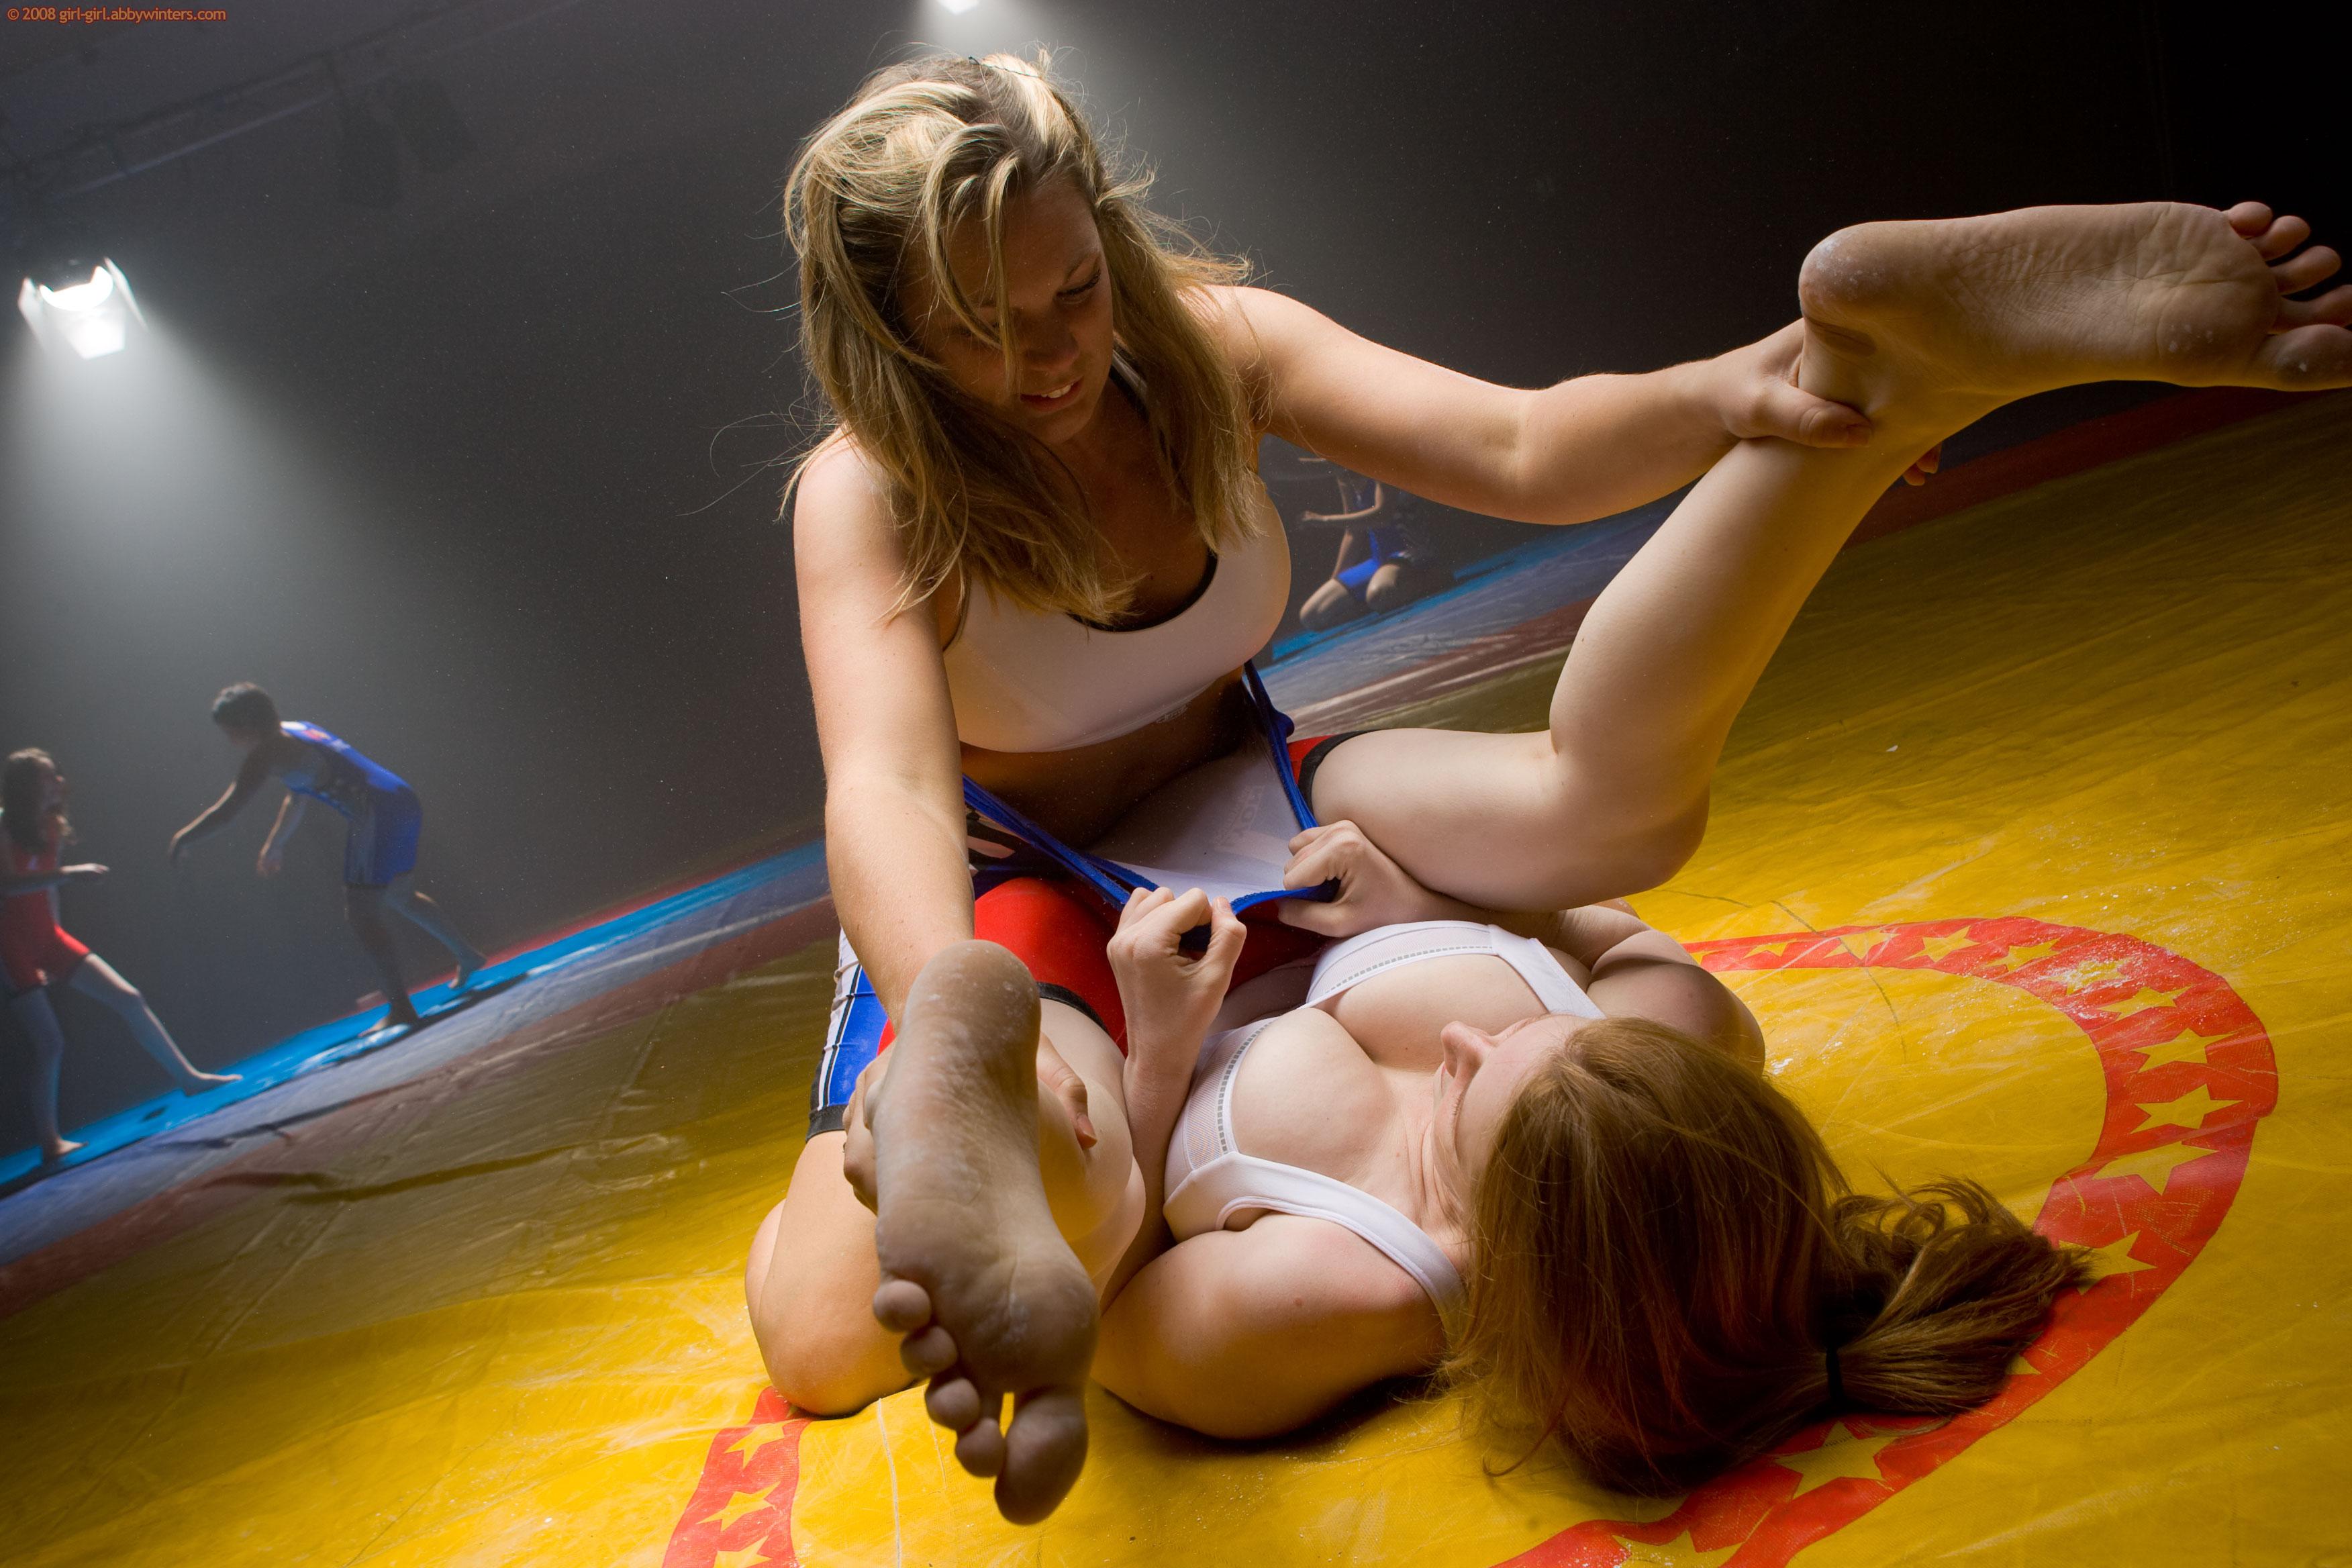 tiny teens in homemade sex